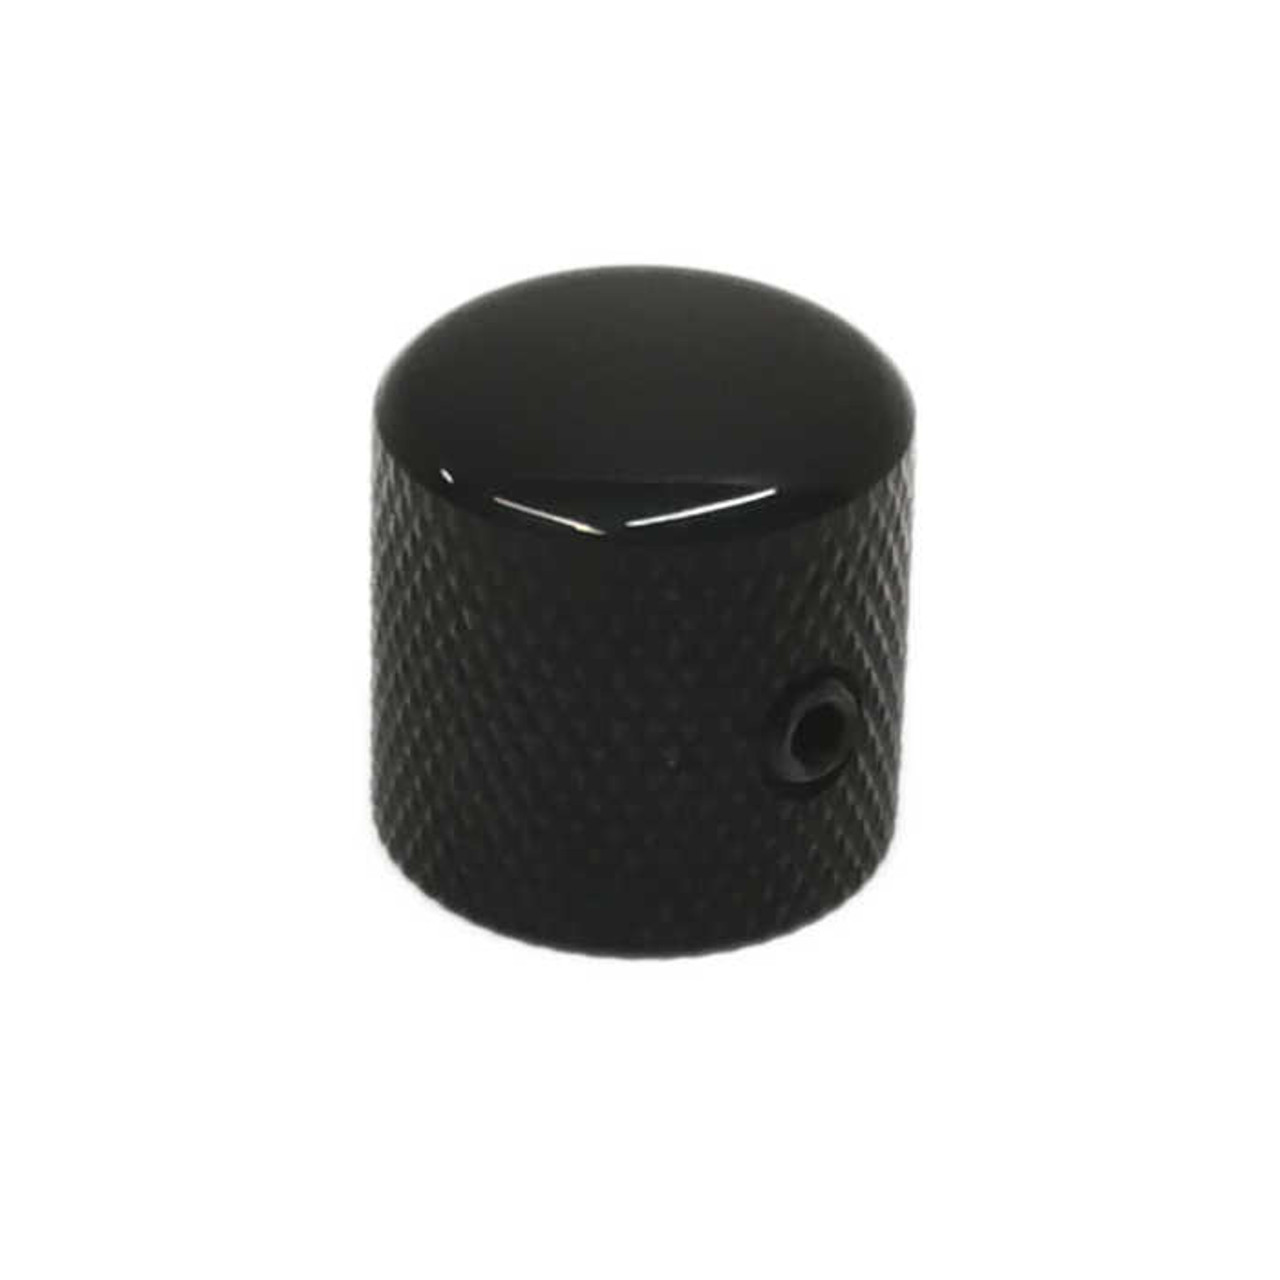 Dome Knob for Solid Shaft - Black